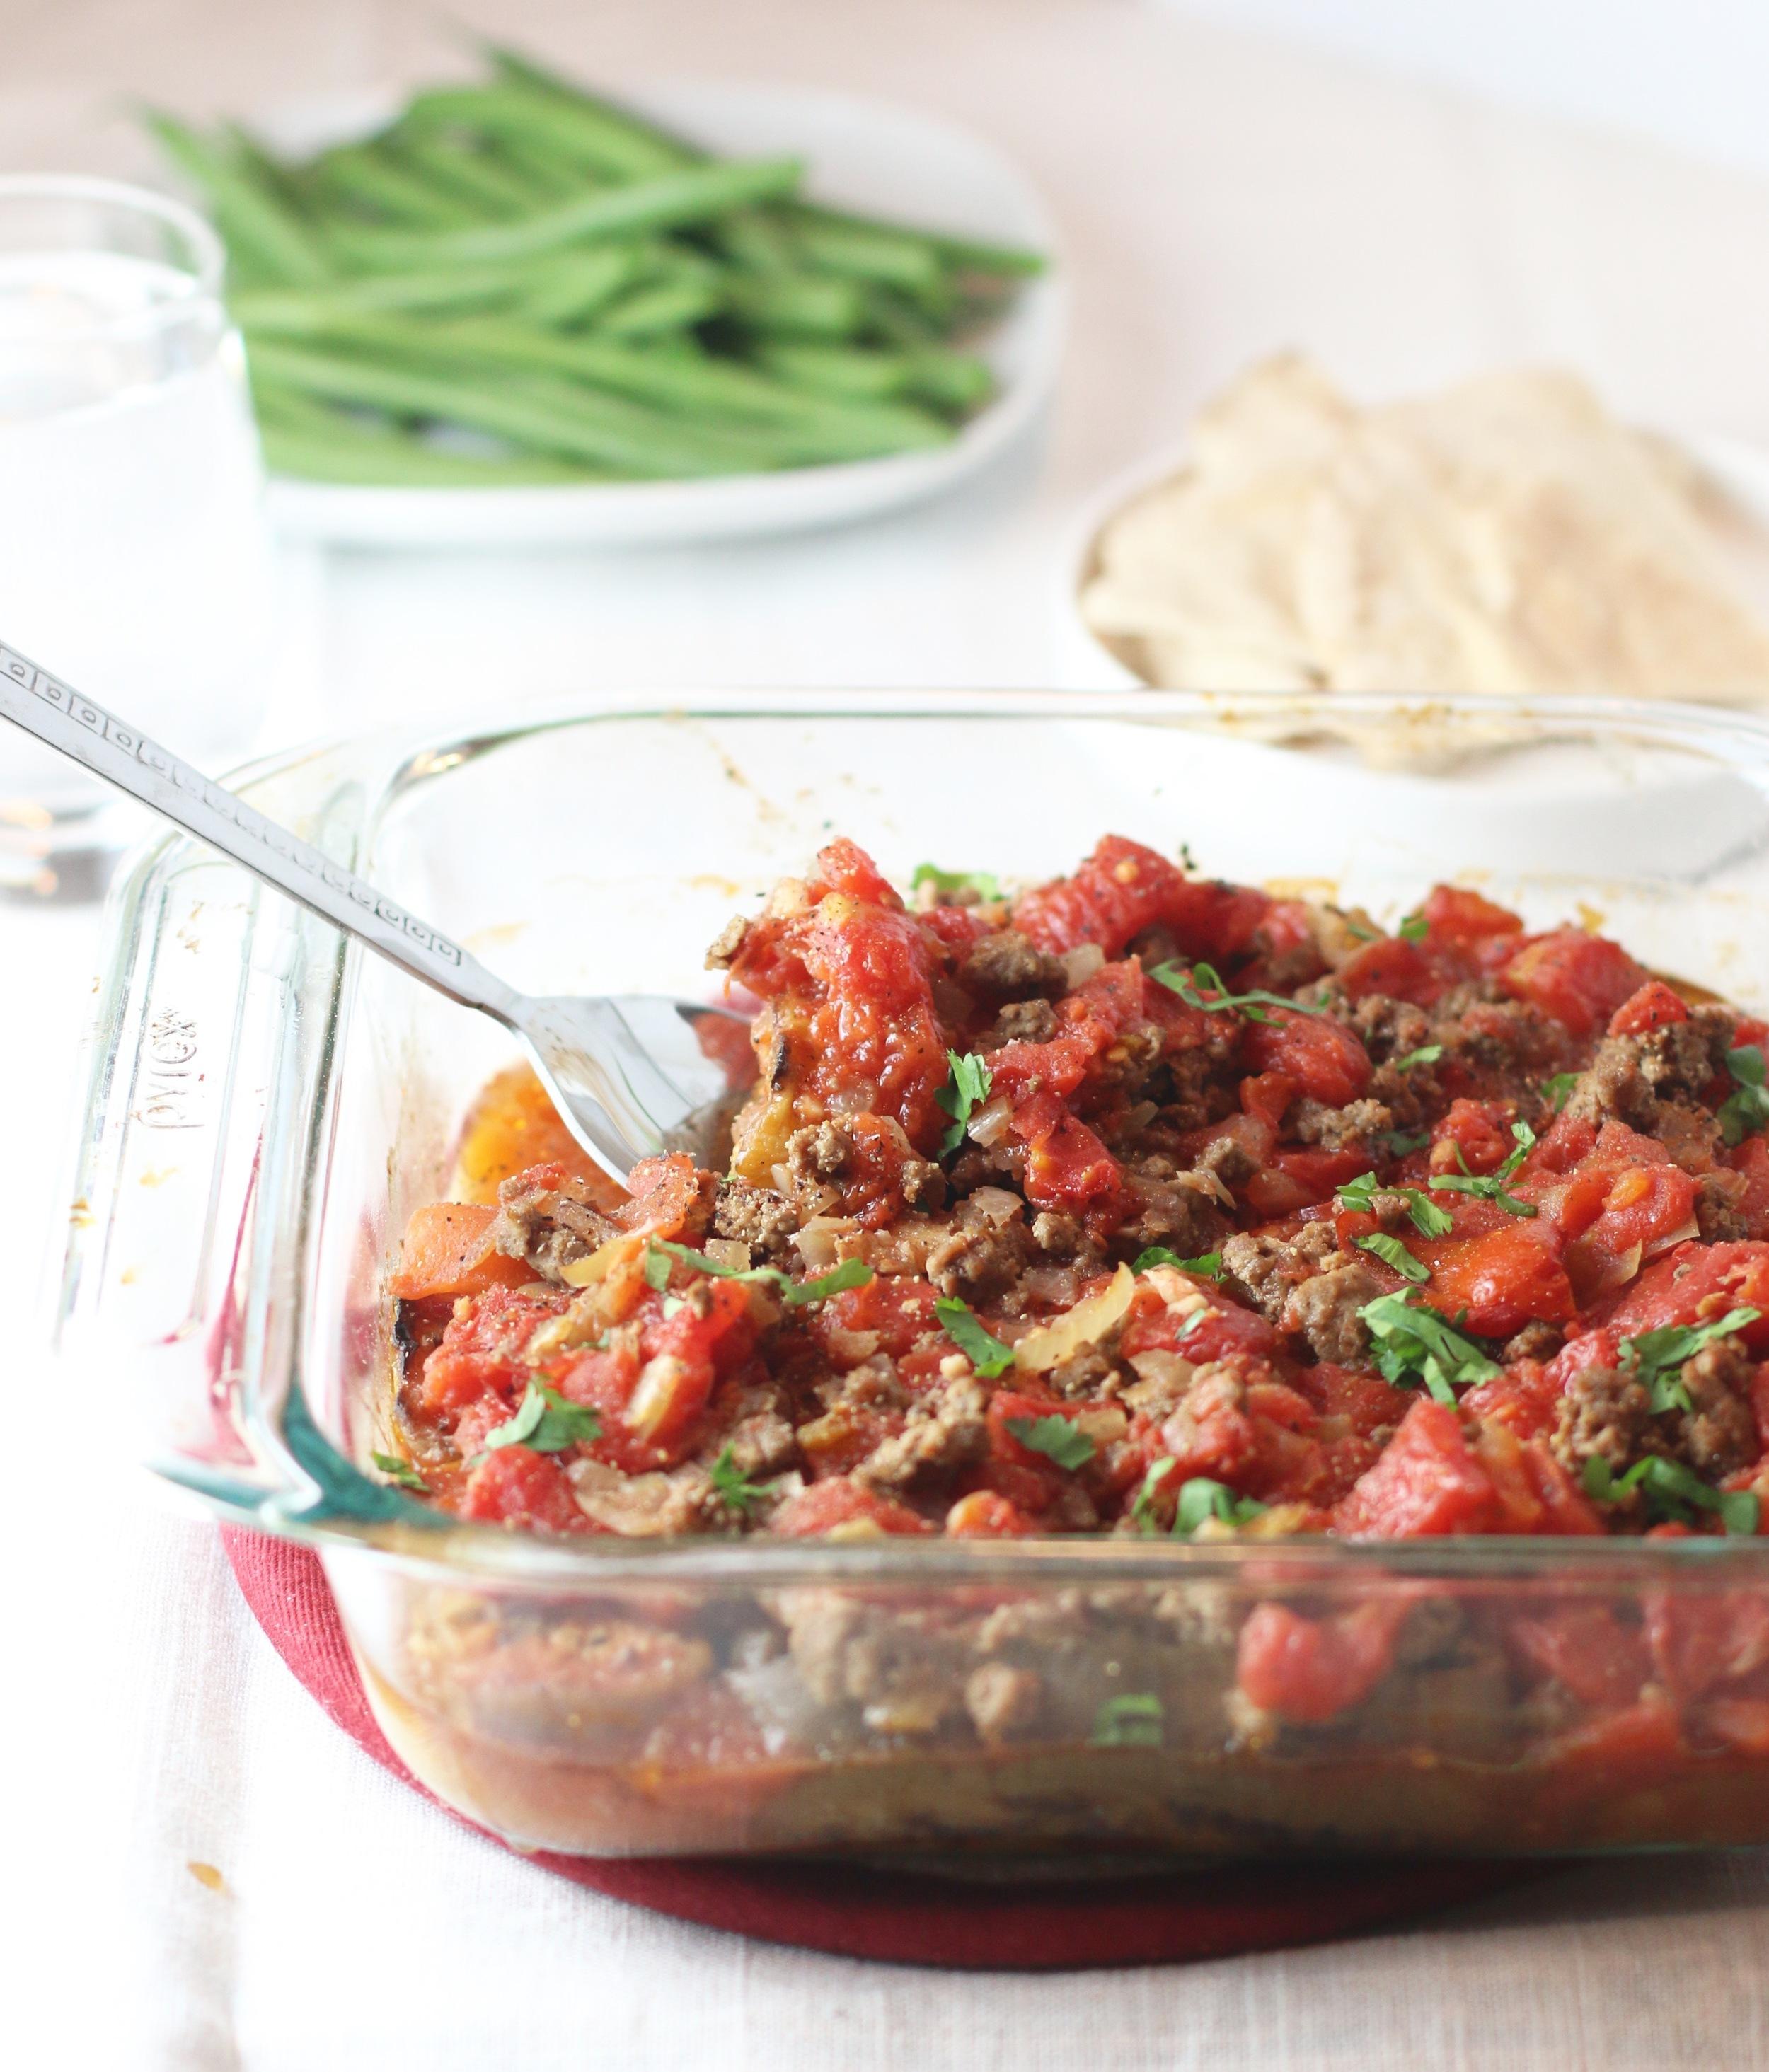 Serve with warm pita bread or white rice